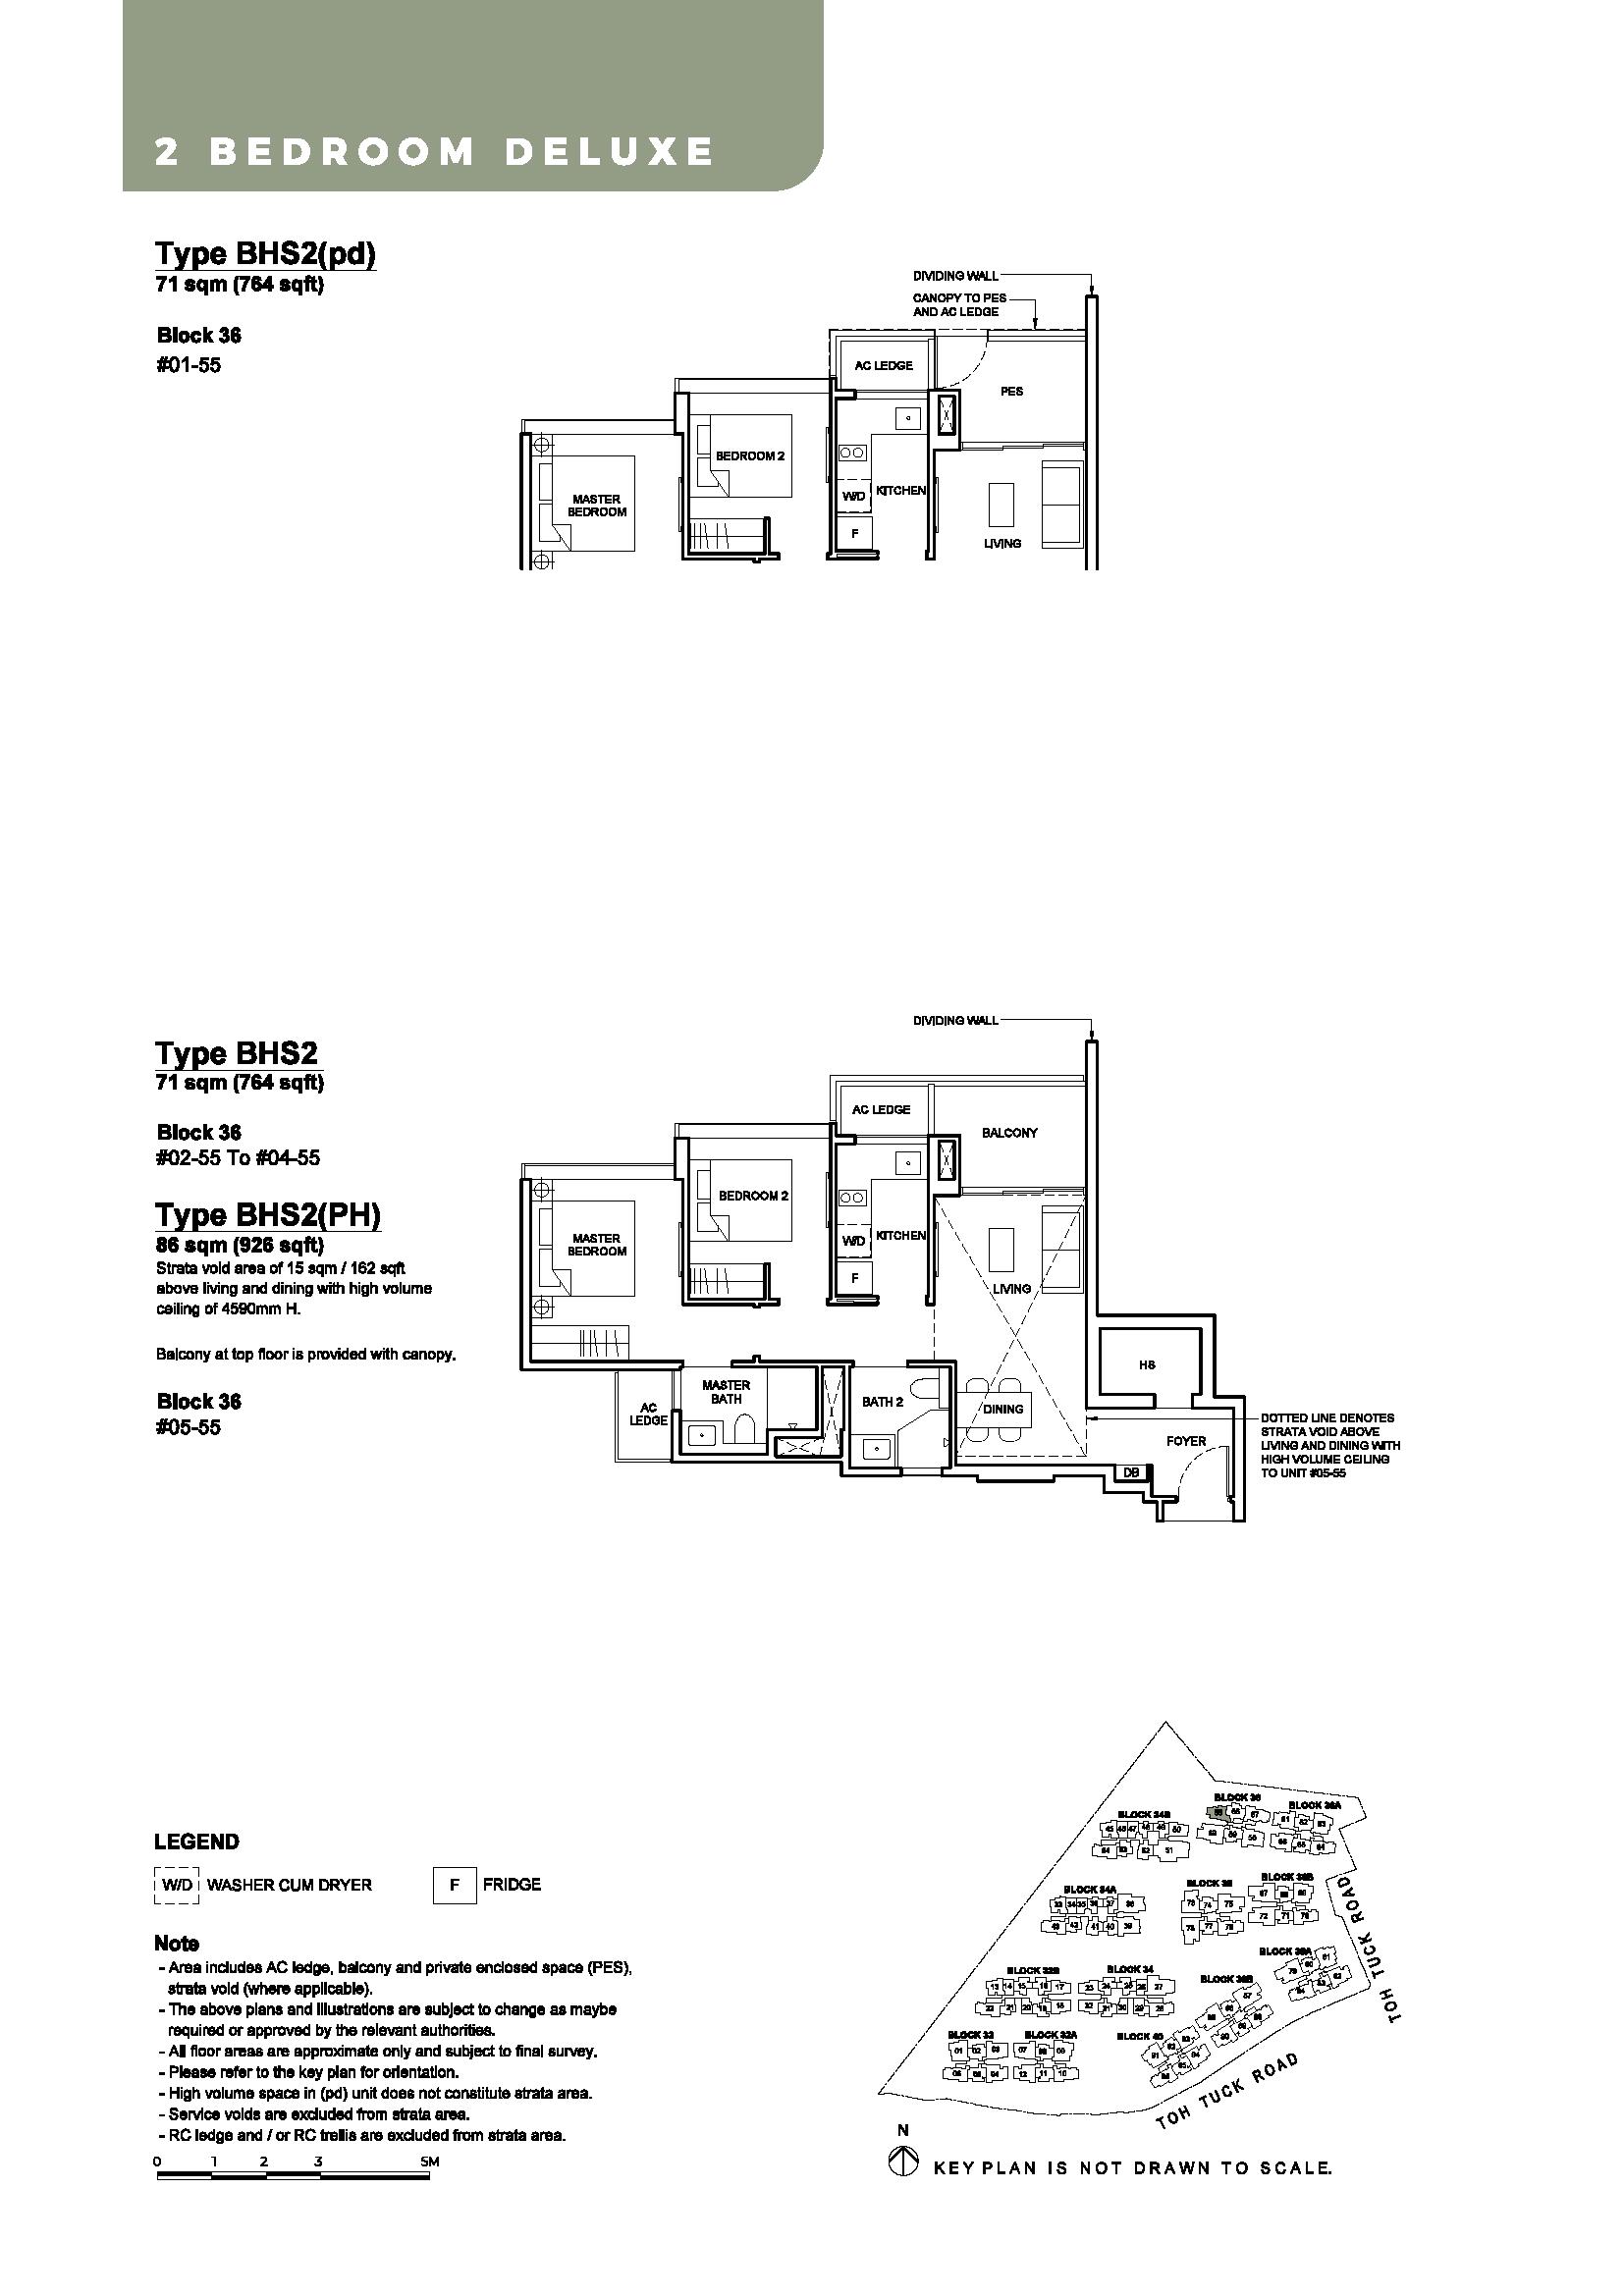 Type BHS2 - BHS2(pd) - BHS2(PH)